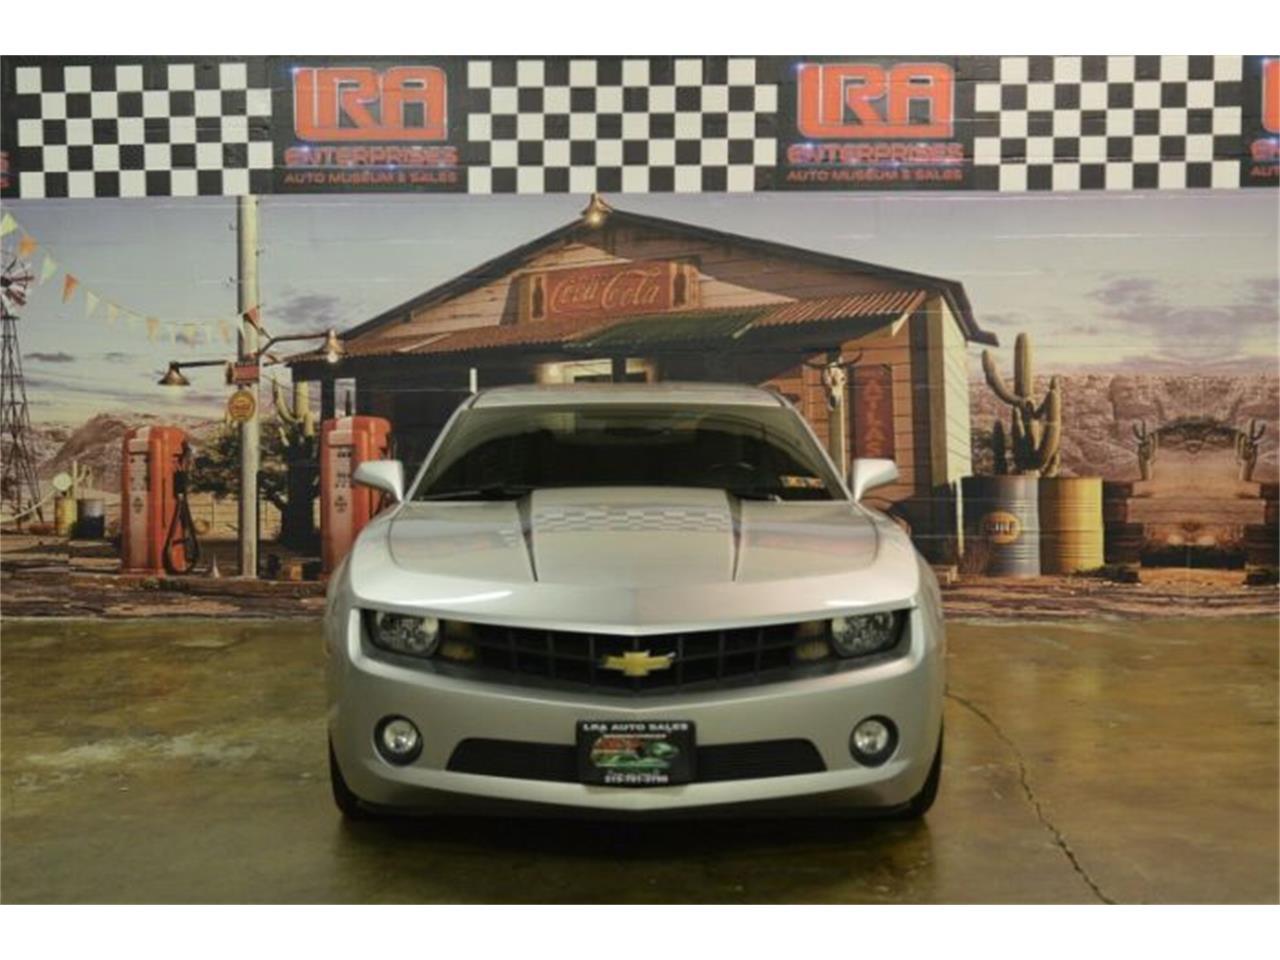 2013 Chevrolet Camaro (CC-1209237) for sale in Cadillac, Michigan